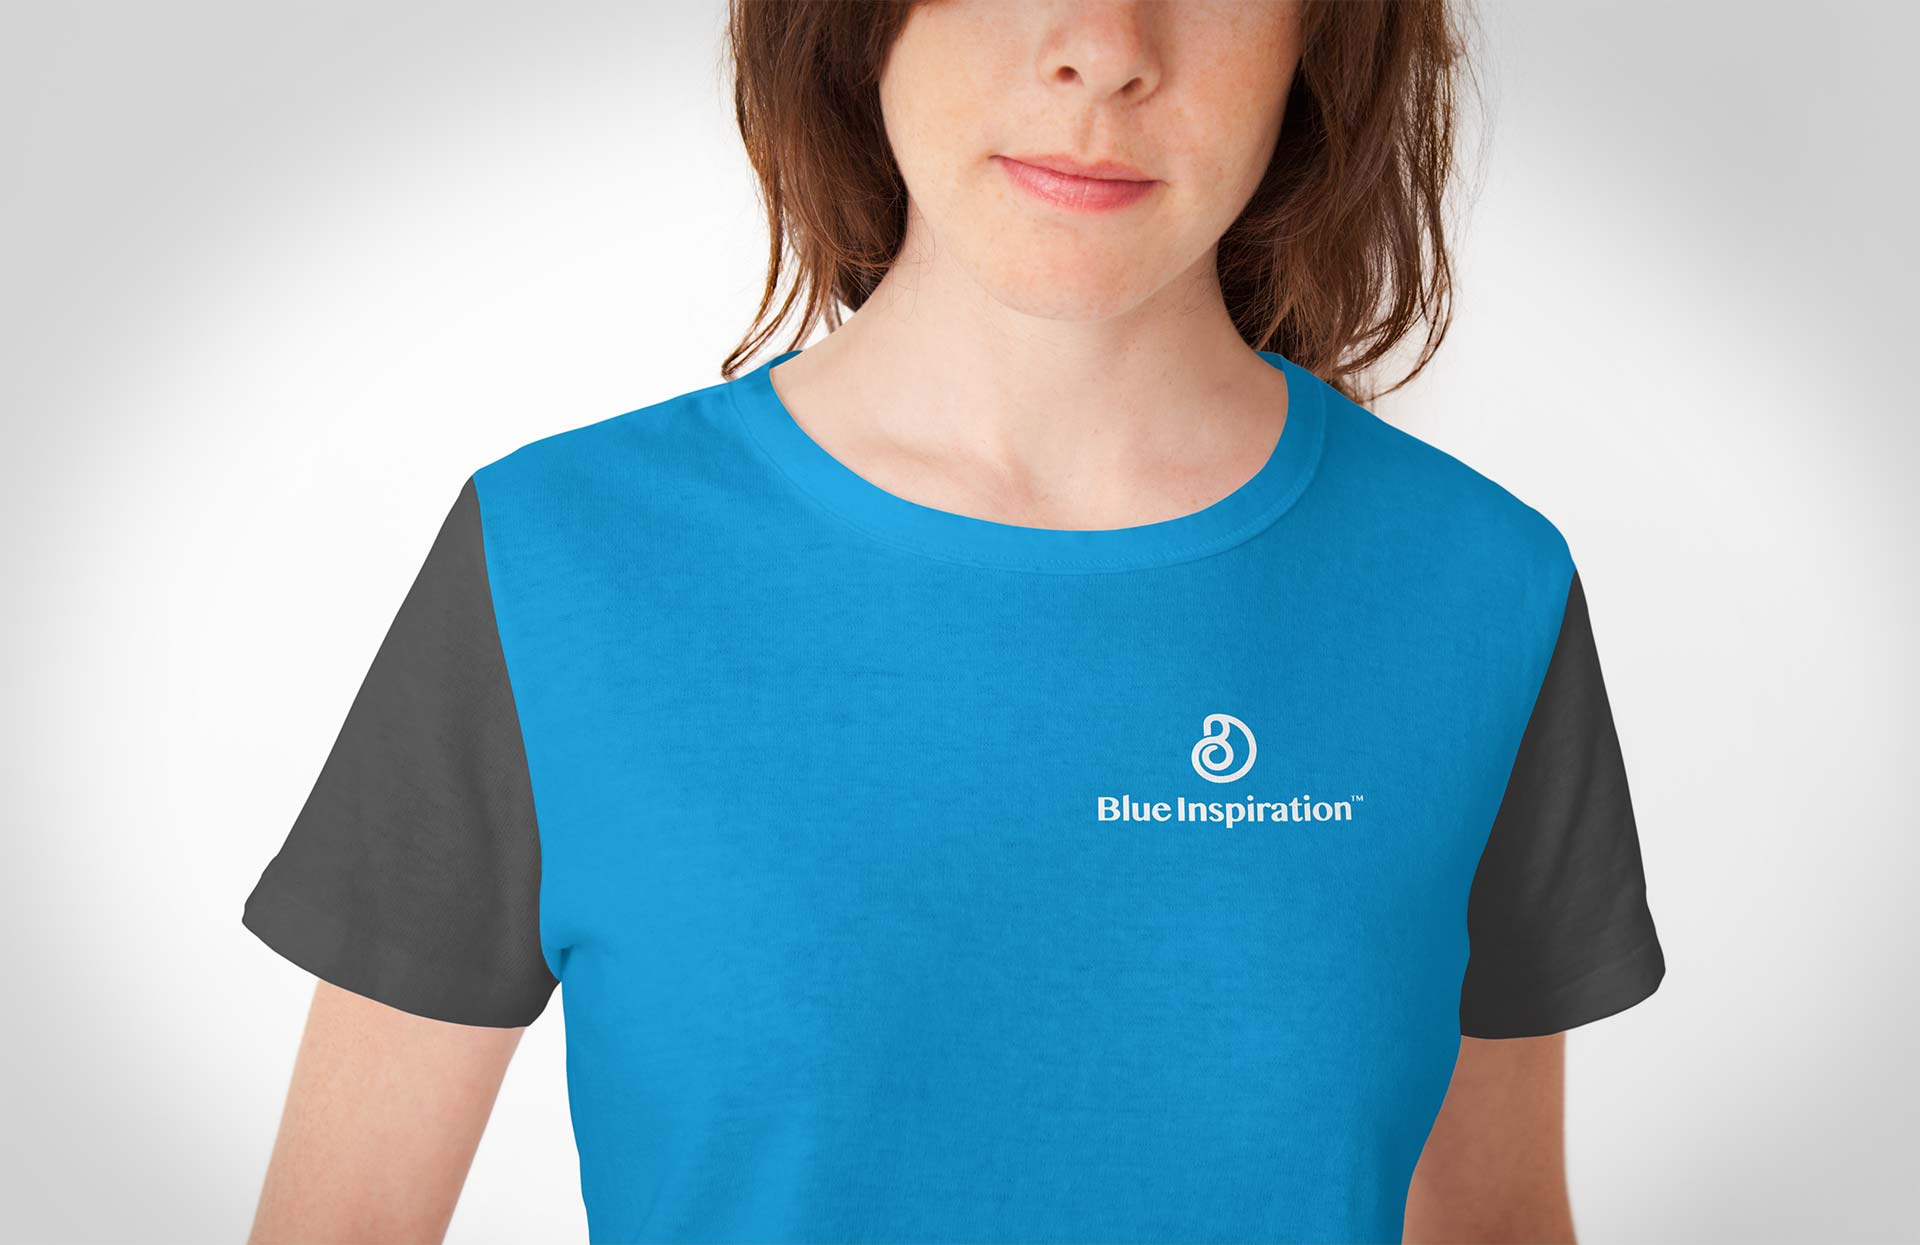 Blue Inspiration Logo on T-shirt